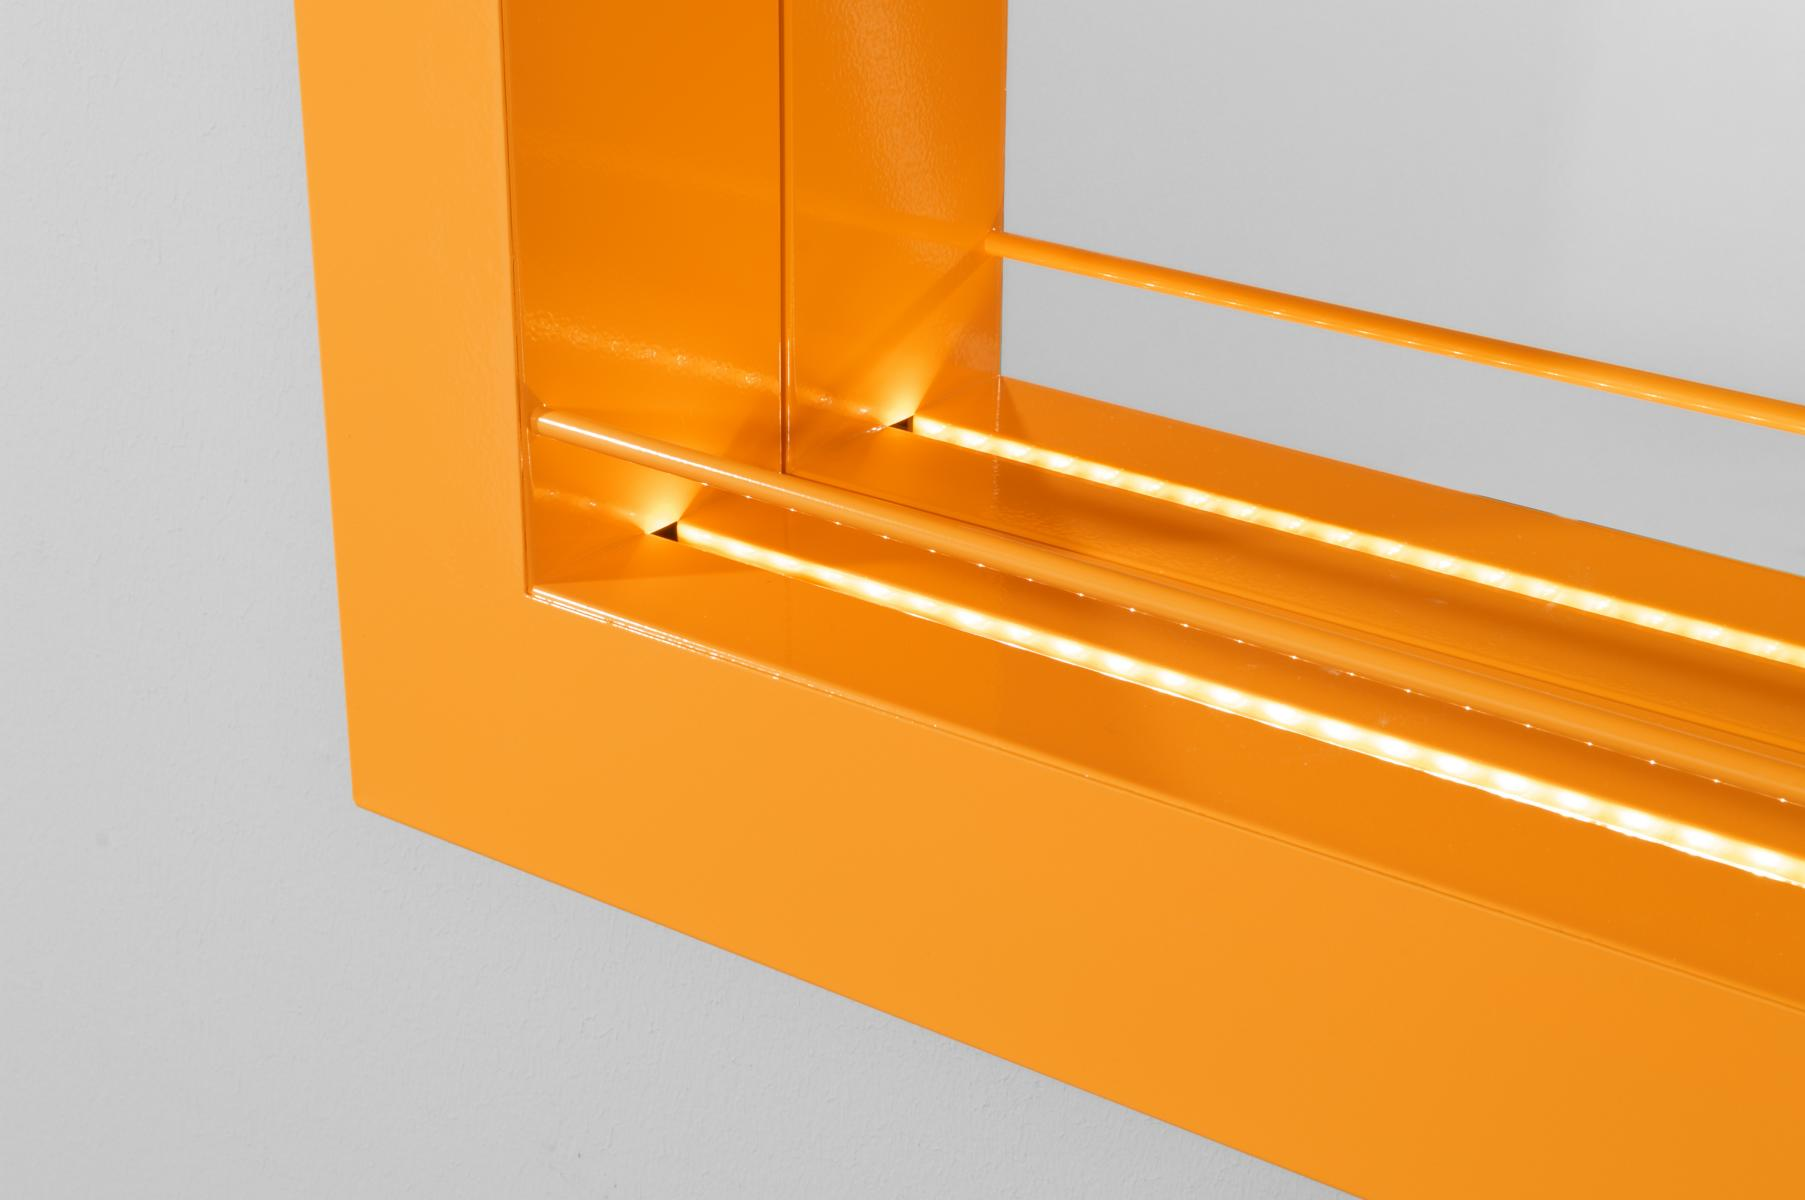 design wandbar wandregal weinregal barregal led. Black Bedroom Furniture Sets. Home Design Ideas